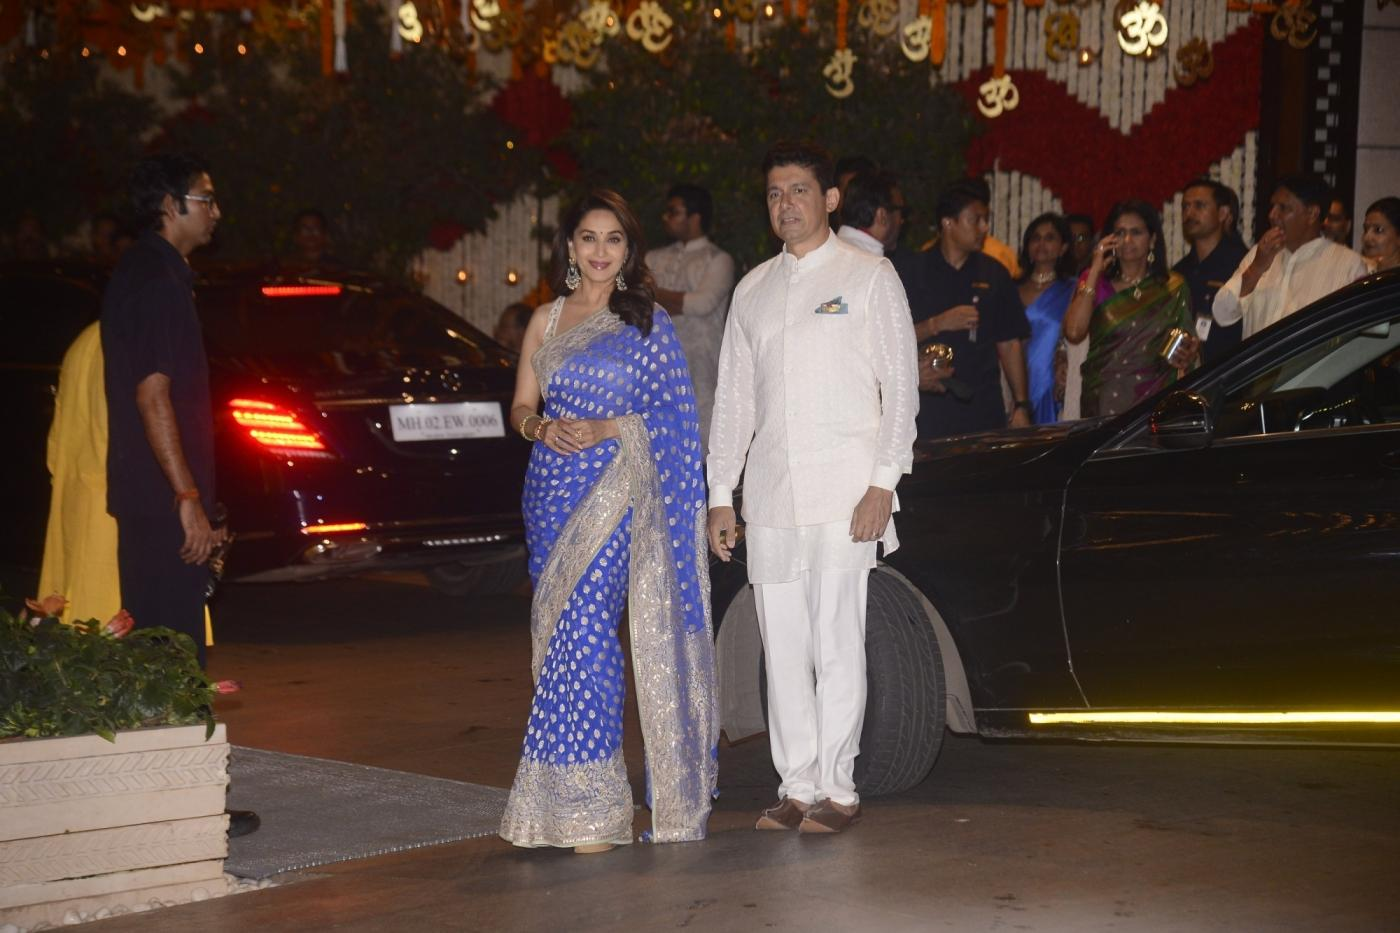 Mumbai: Actress Madhuri Dixit Nene along with her husband Sriram Madhav Nene arrive at Reliance Industries Chairman and MD Mukesh Ambani's residence to celebrate Ganesh Chaturthi in Mumbai on Sept 13, 2018. (Photo: IANS) by .